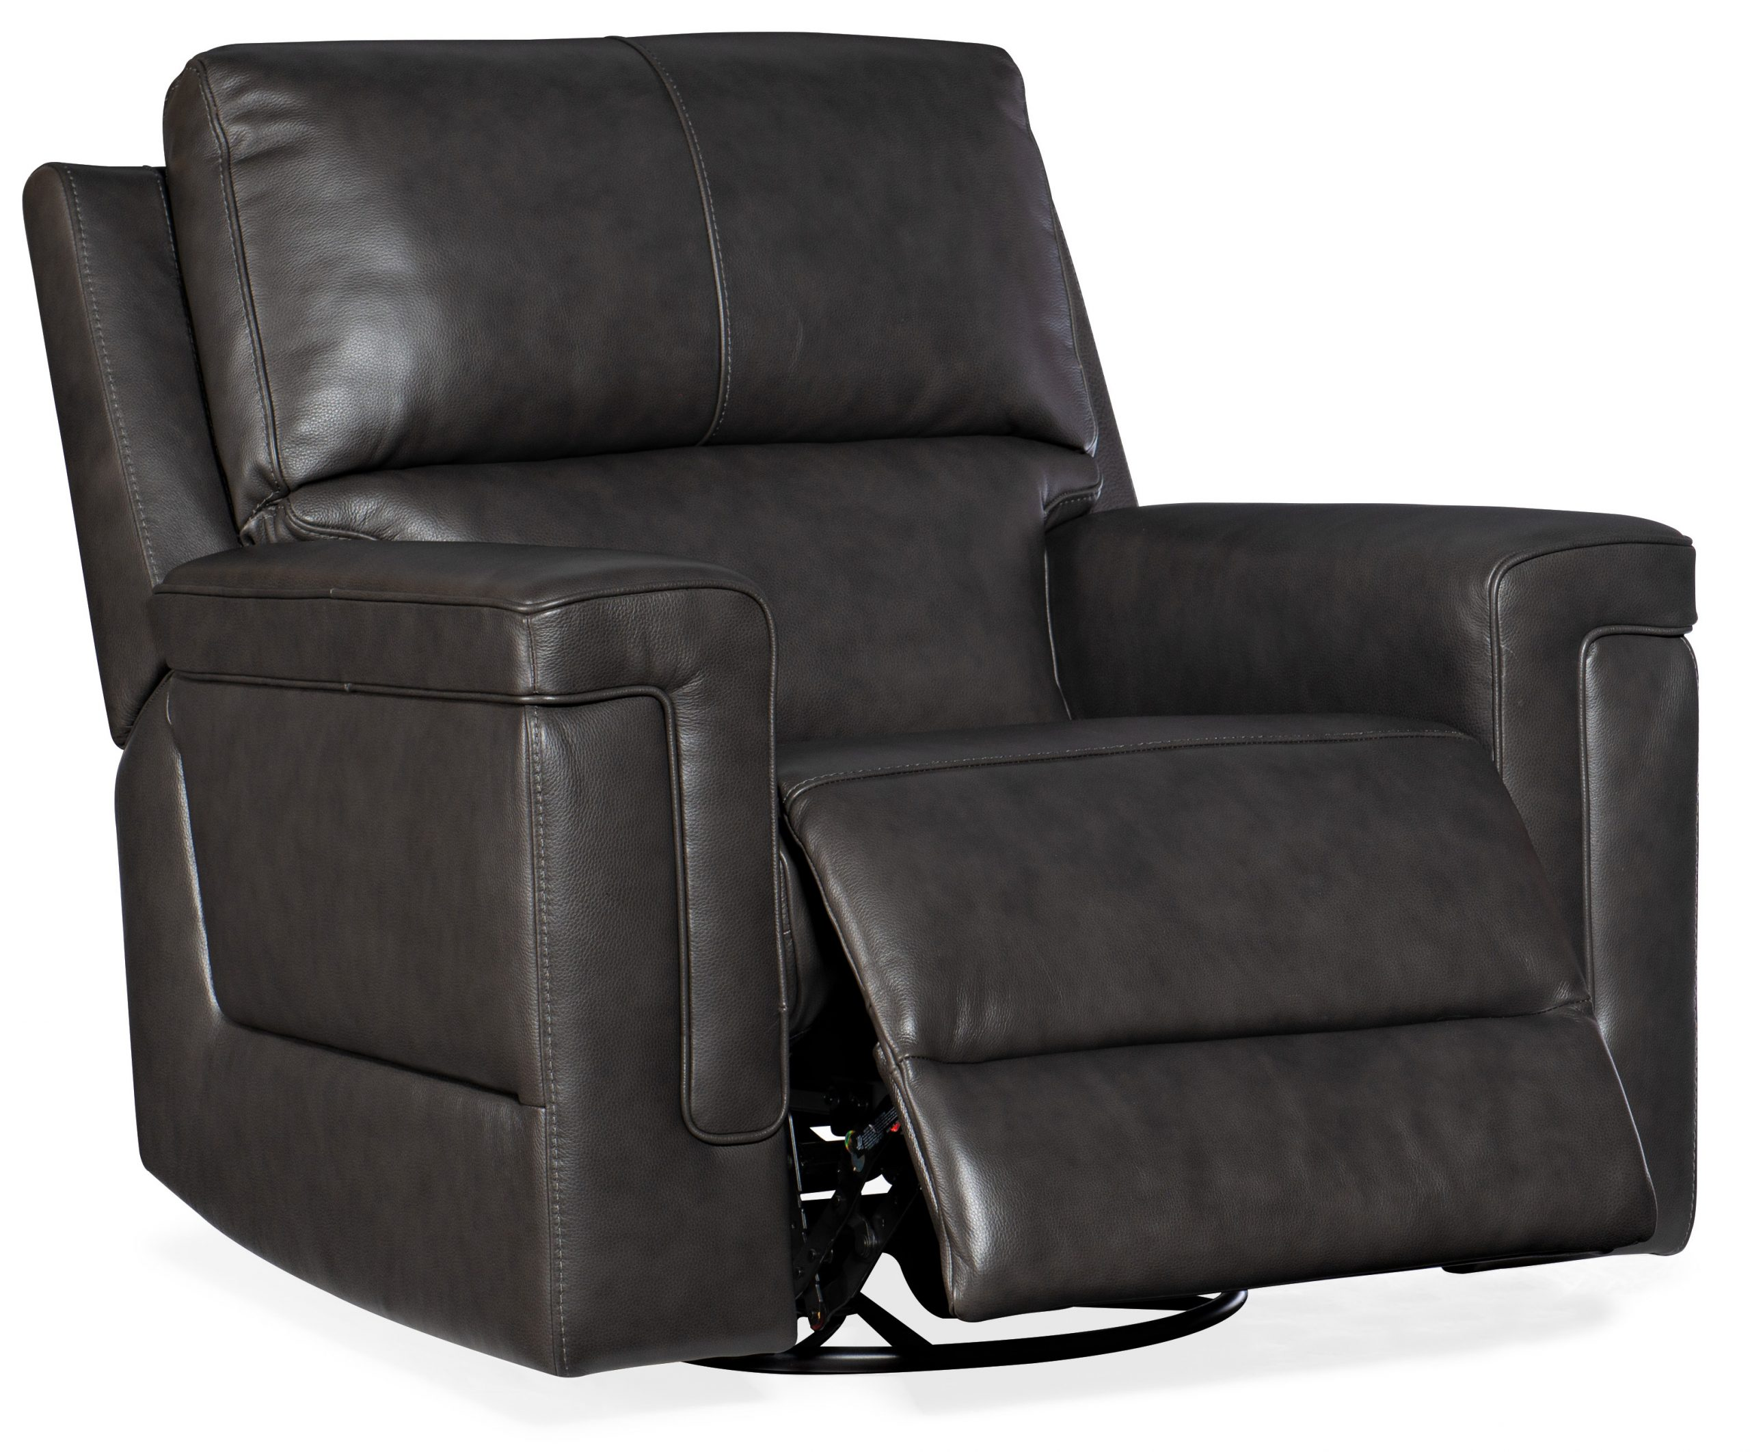 Gable Leather PWR Swivel Glider w/ PWR Headrest